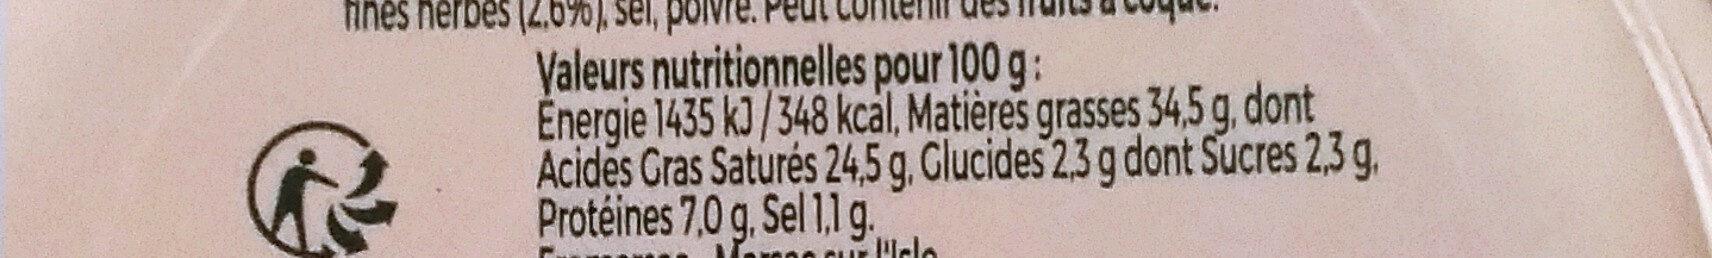 Tartare - familial - Informations nutritionnelles - fr